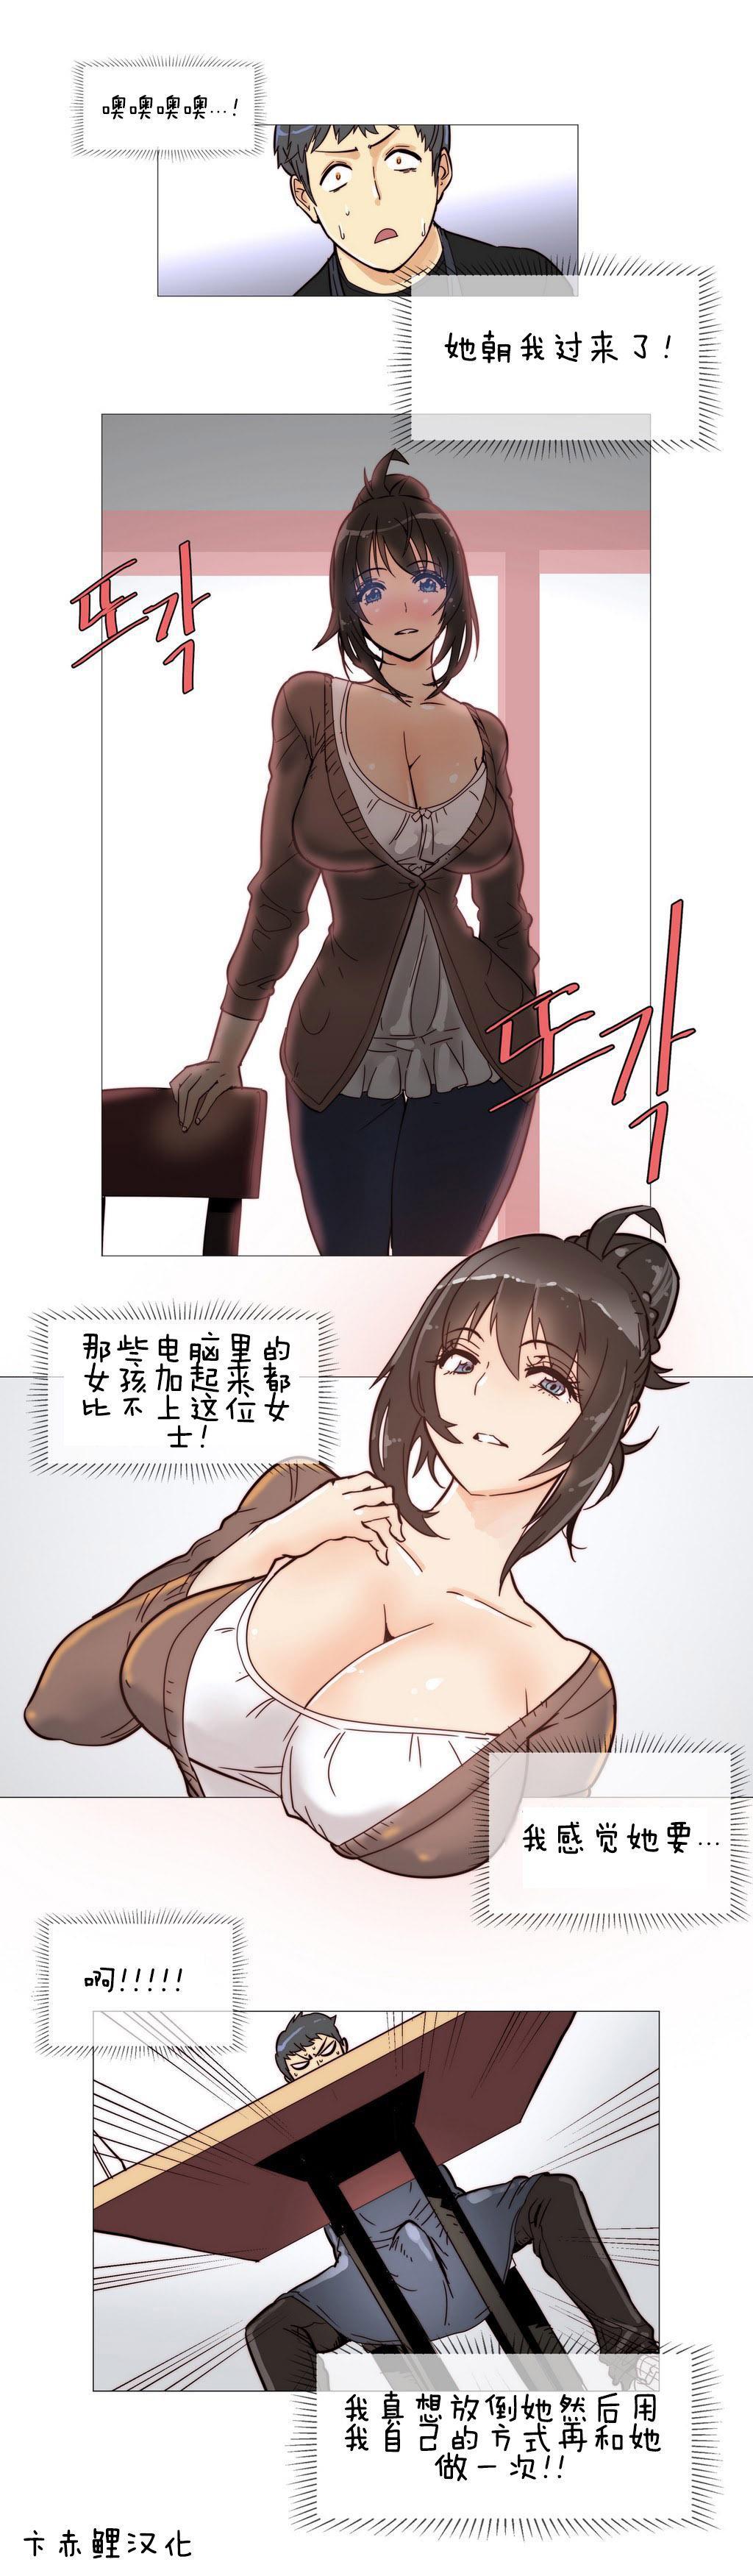 HouseHold Affairs 【卞赤鲤个人汉化】1~33话(持续更新中) 67